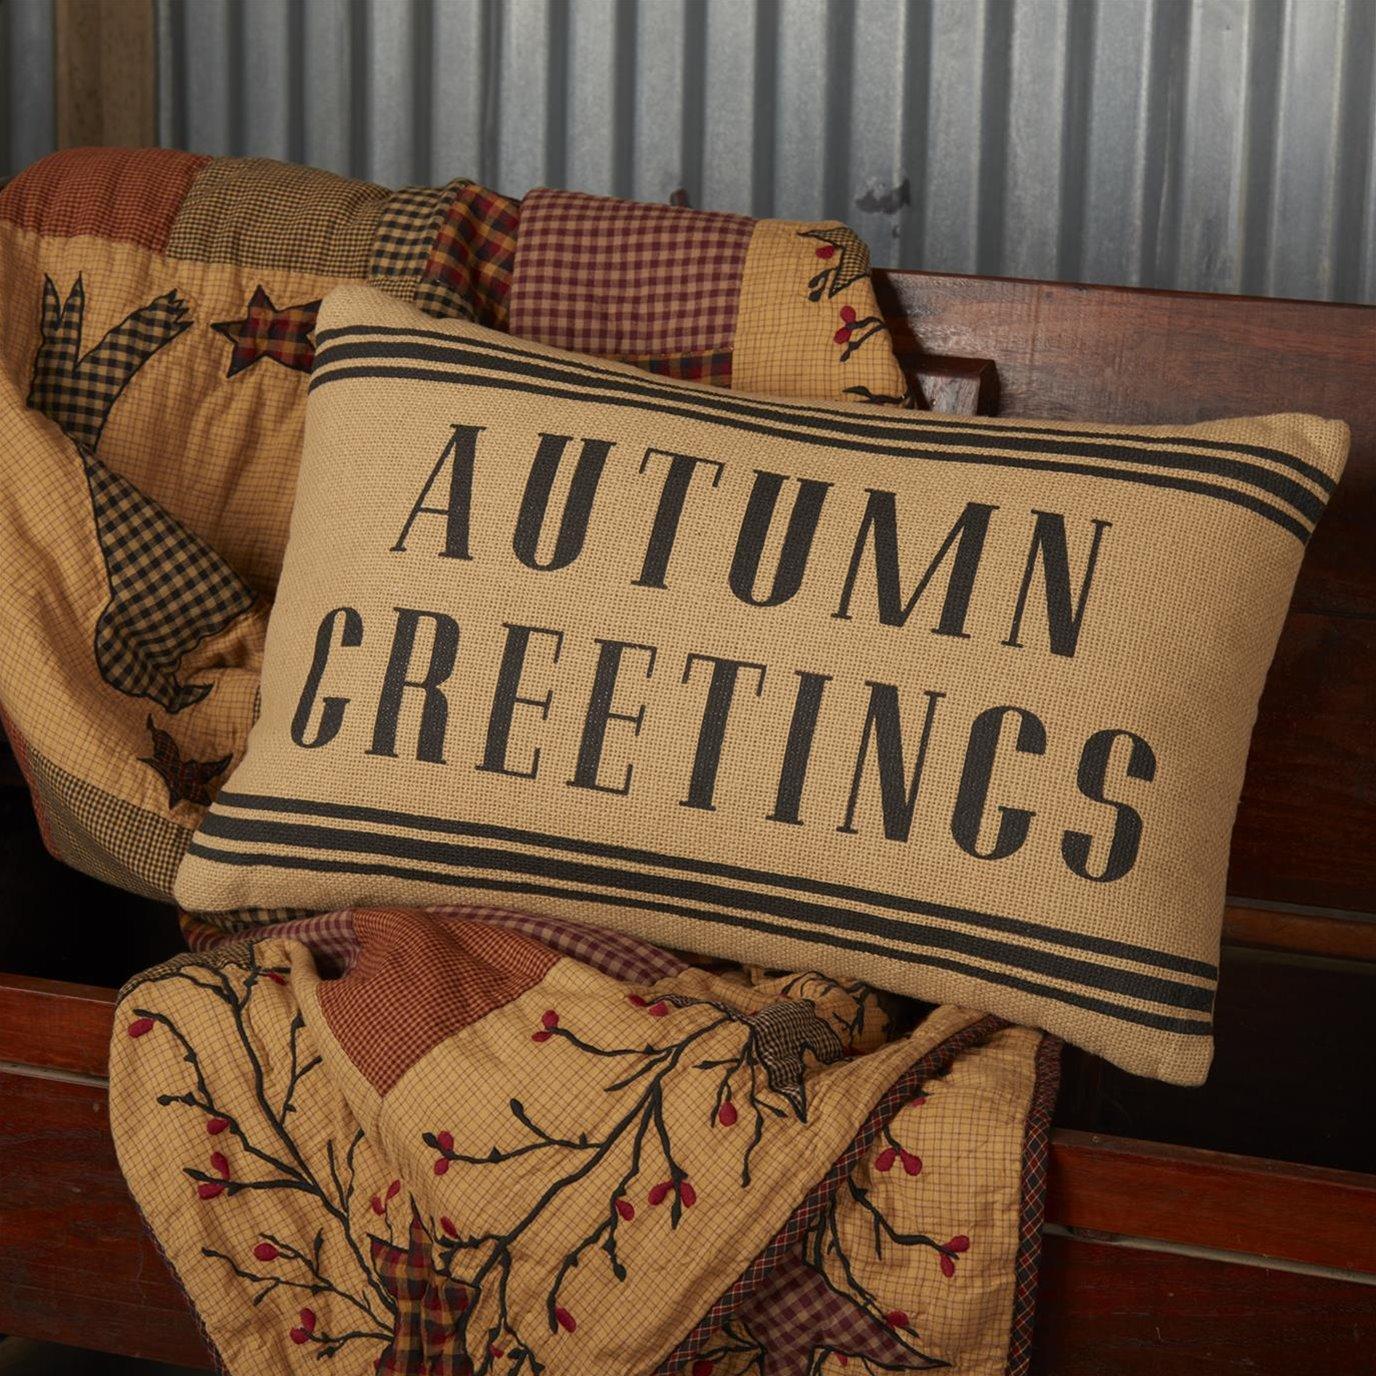 Heritage Farms Autumn Greetings Pillow 14x22